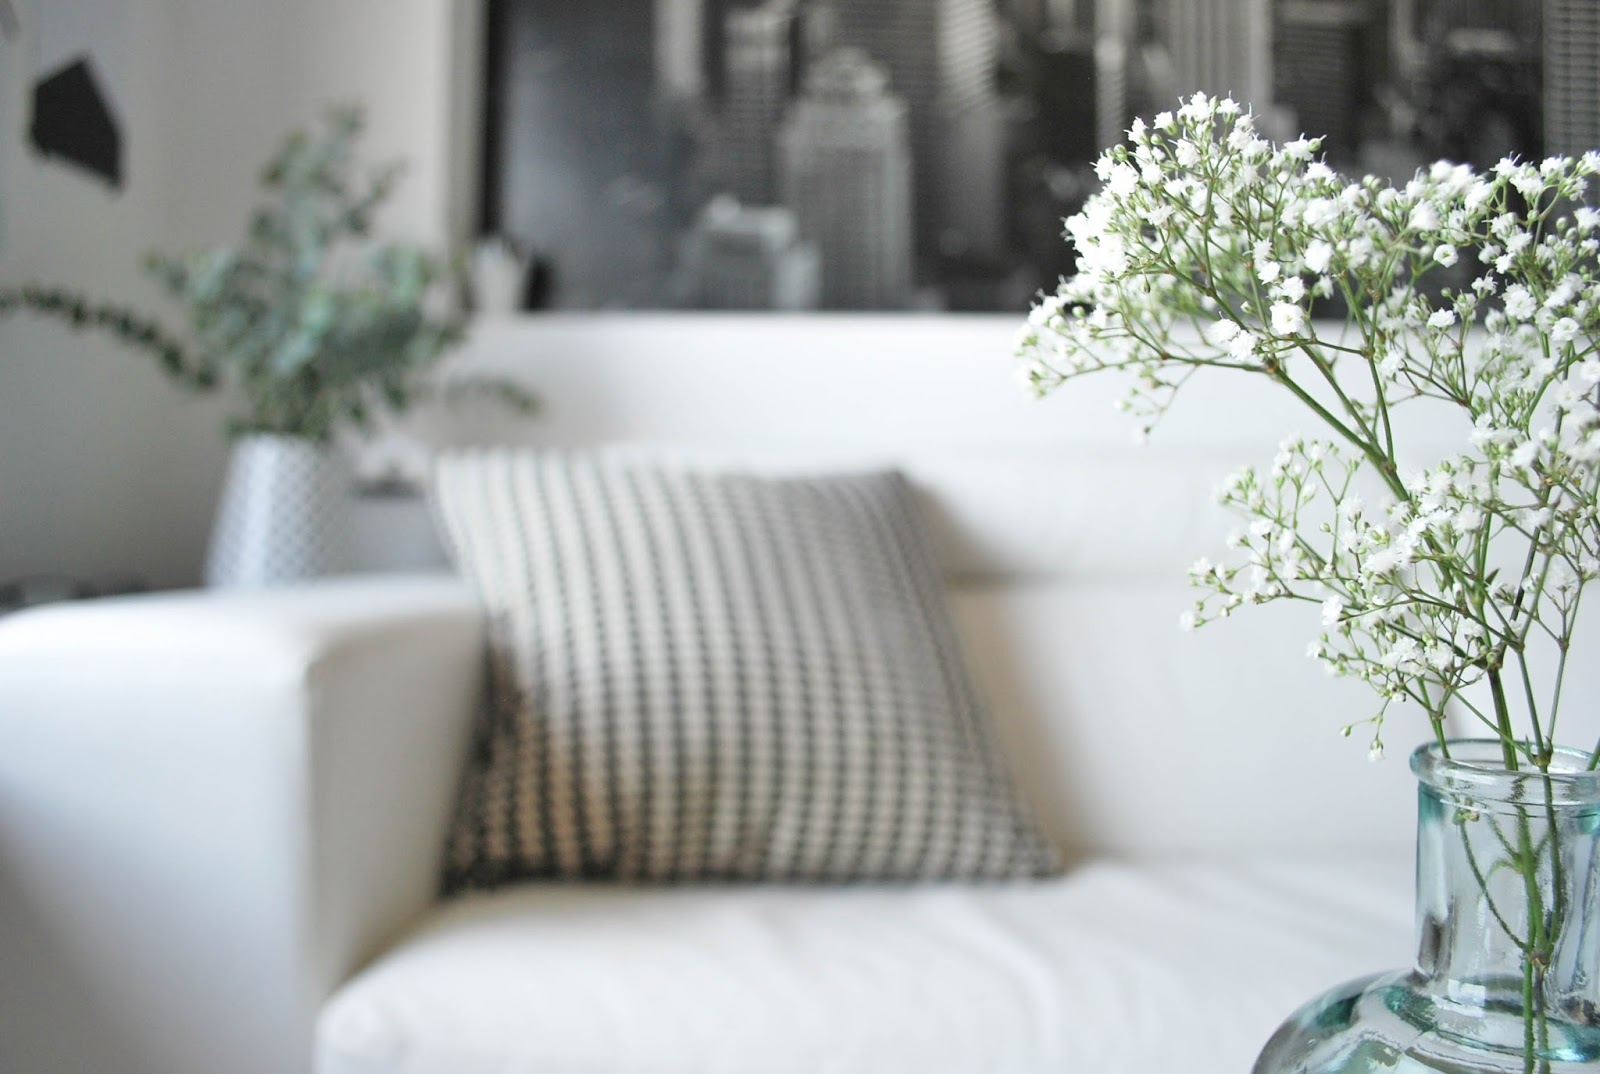 http://www.hommum.com/2014/06/my-home-mi-rincon-de-lectura.html #scandinavianstyle #estilonordico